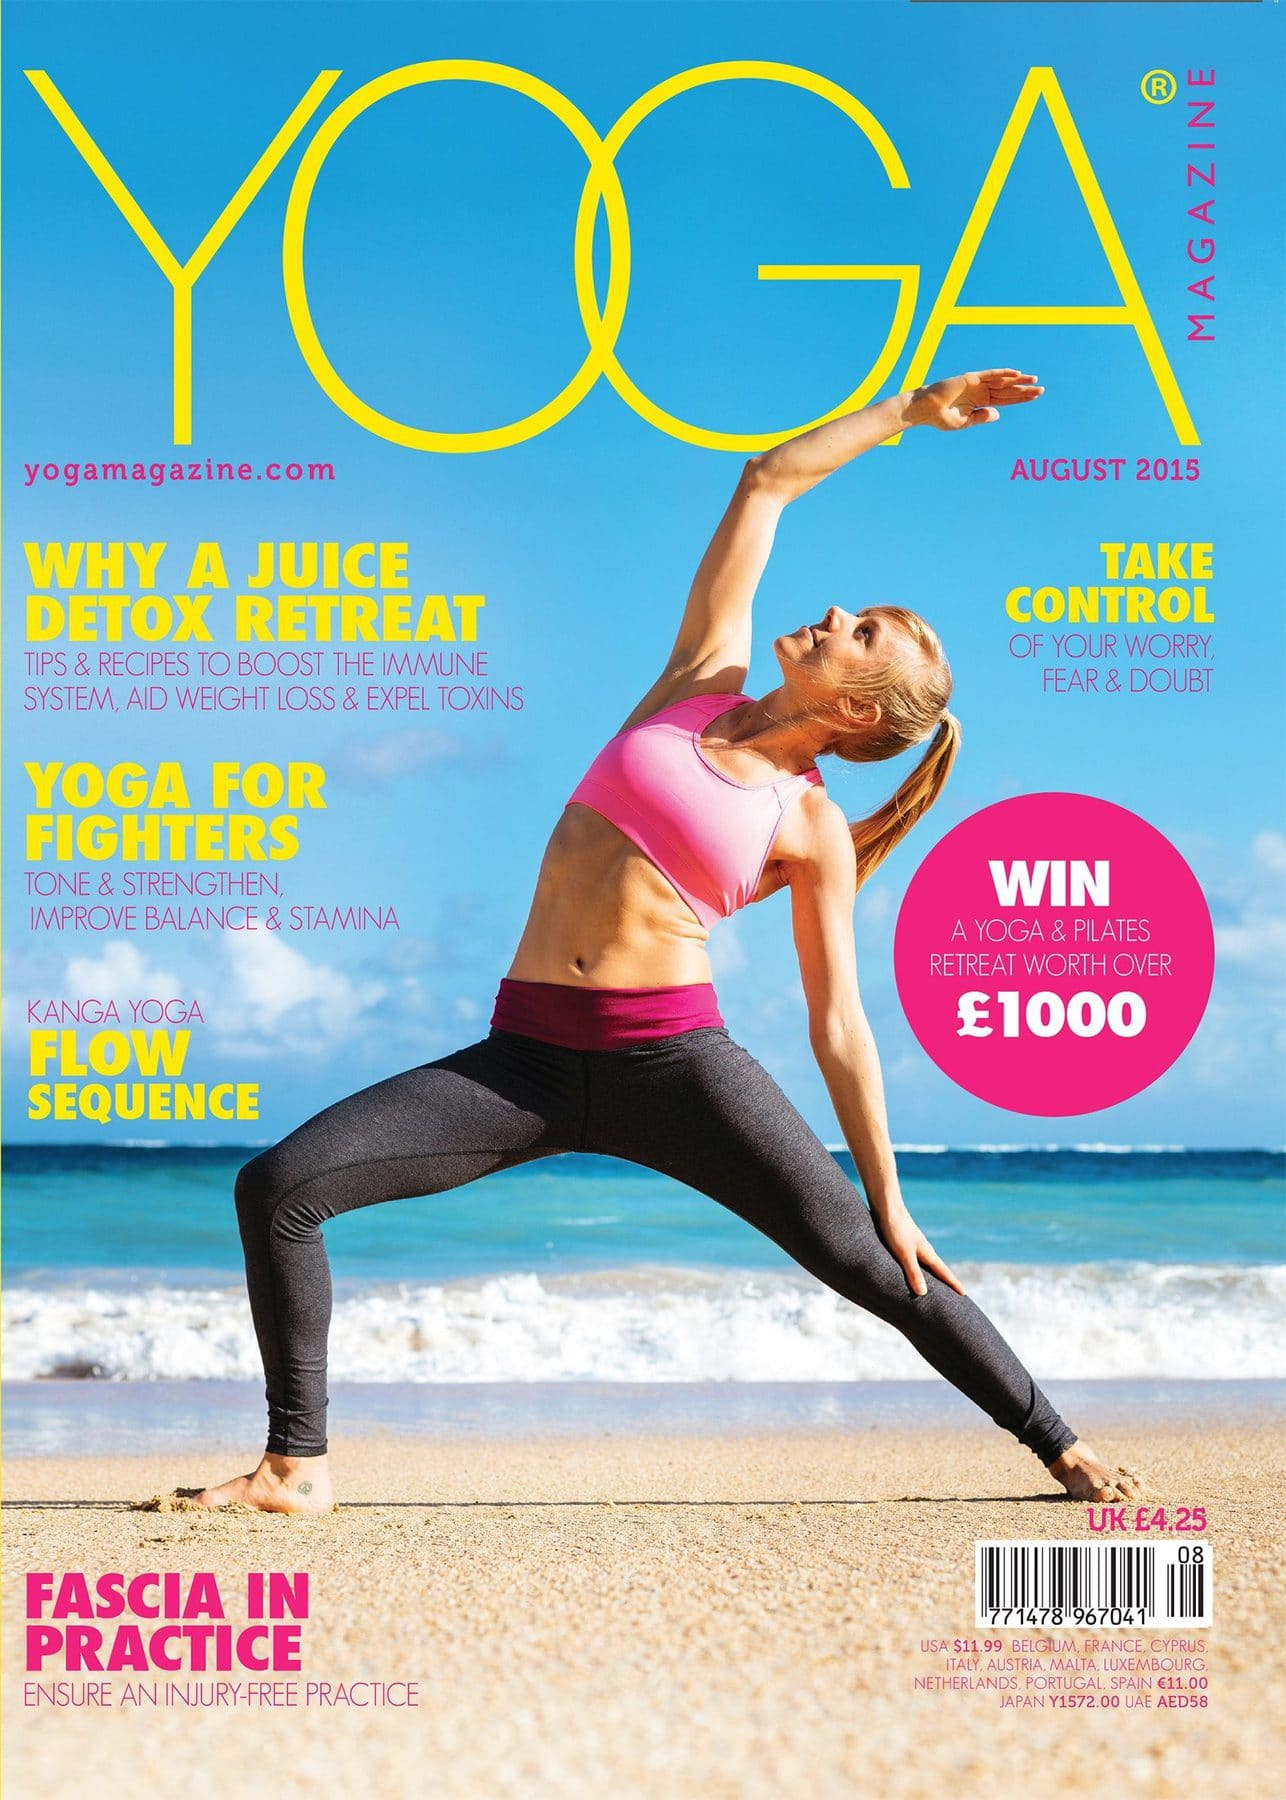 Why a Juice Detox Platinum Healing in Yoga Magazine